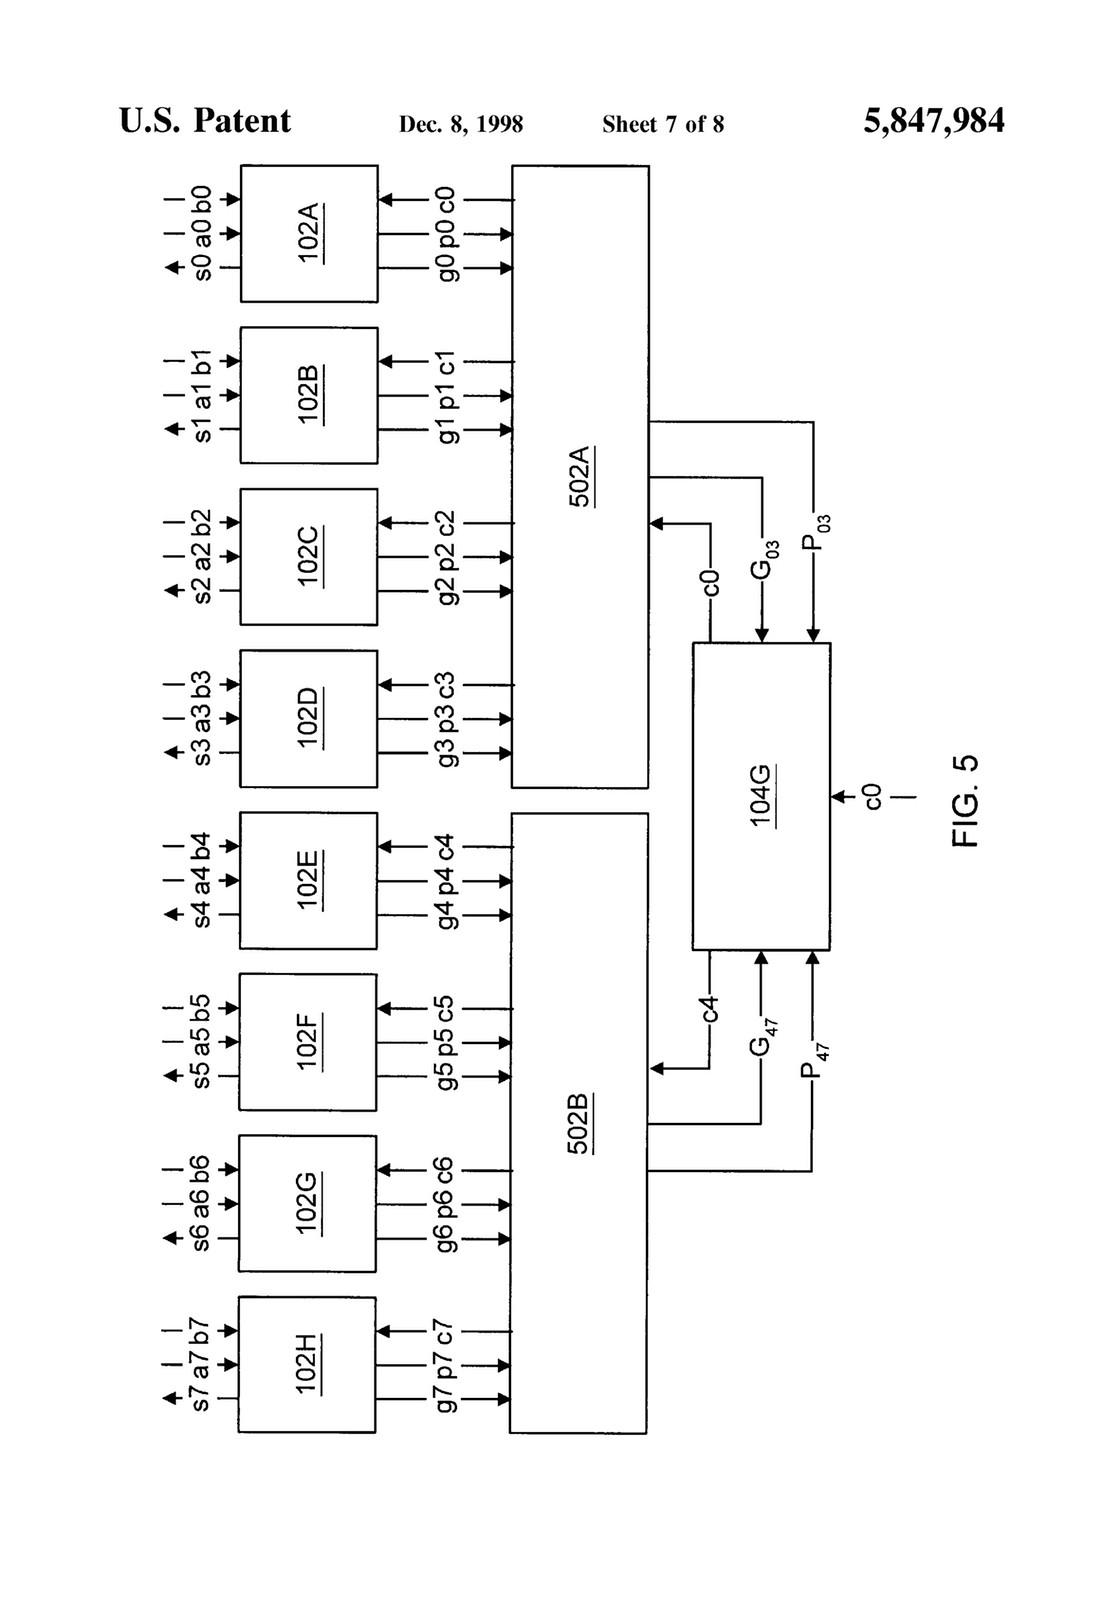 Electrical Floor Plan Patent Us Multiplexer Based Parallel N Bit Adder Drawing